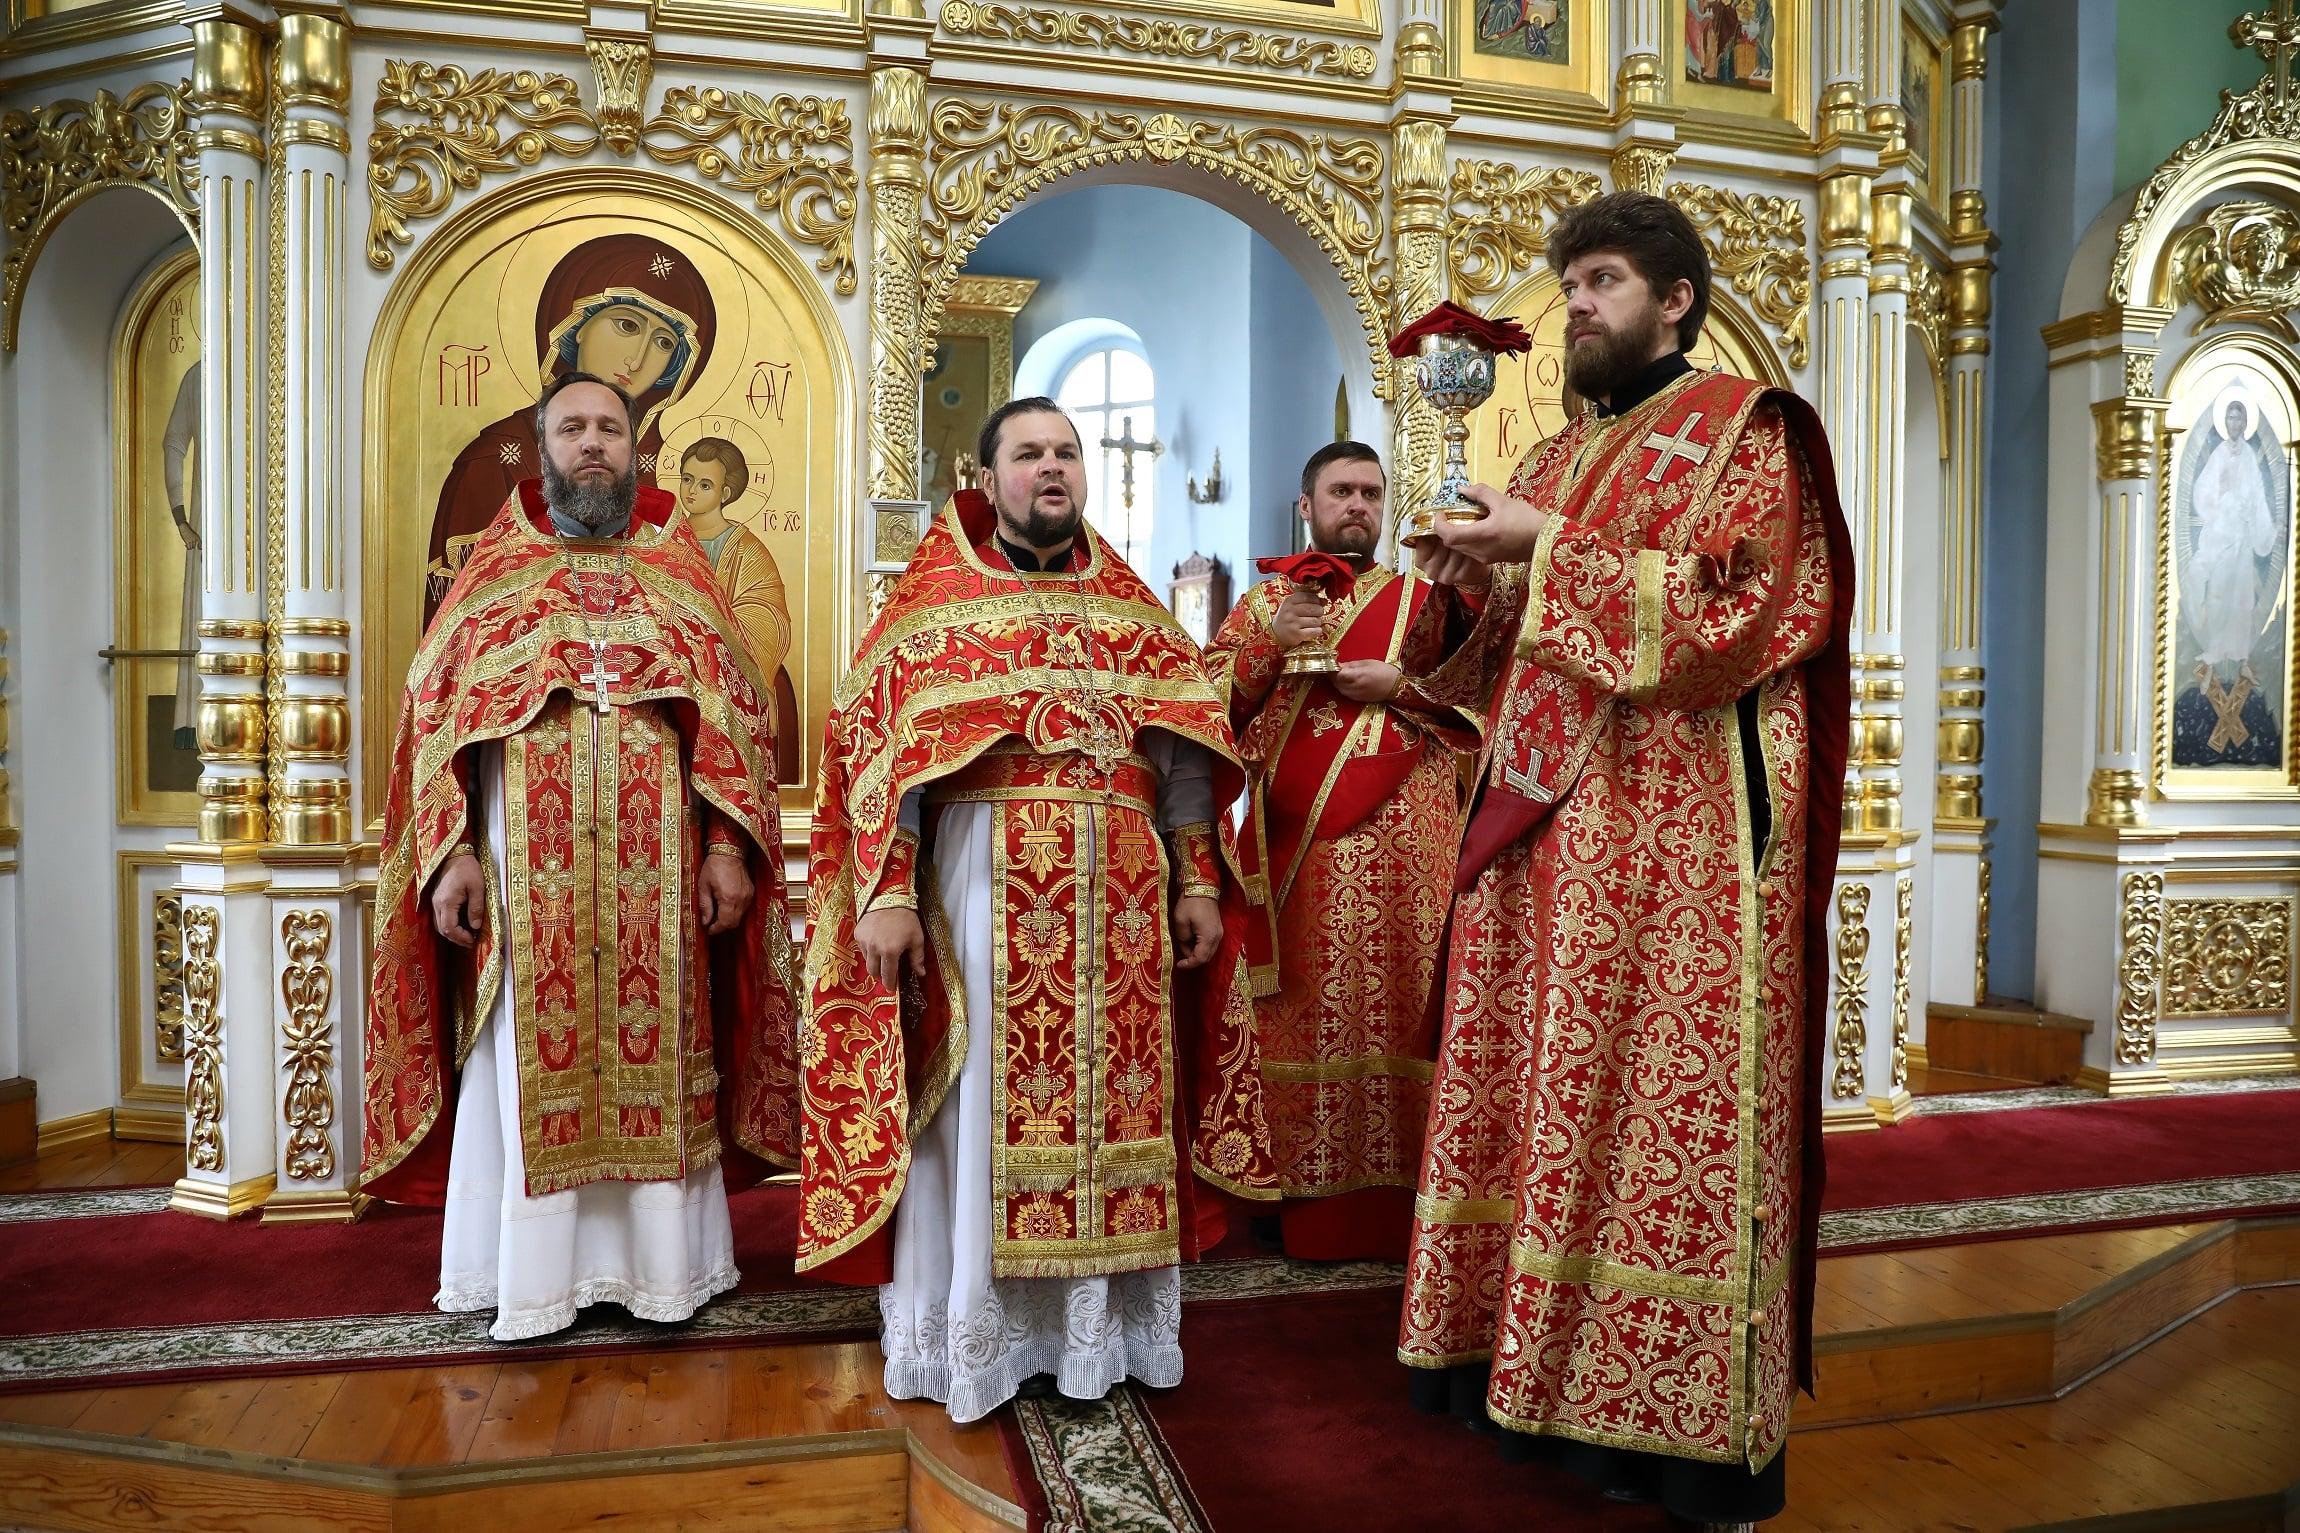 http://monuspen.ru/photoreports/6fe34d0b1744123e0a9091cd842914bu.jpg